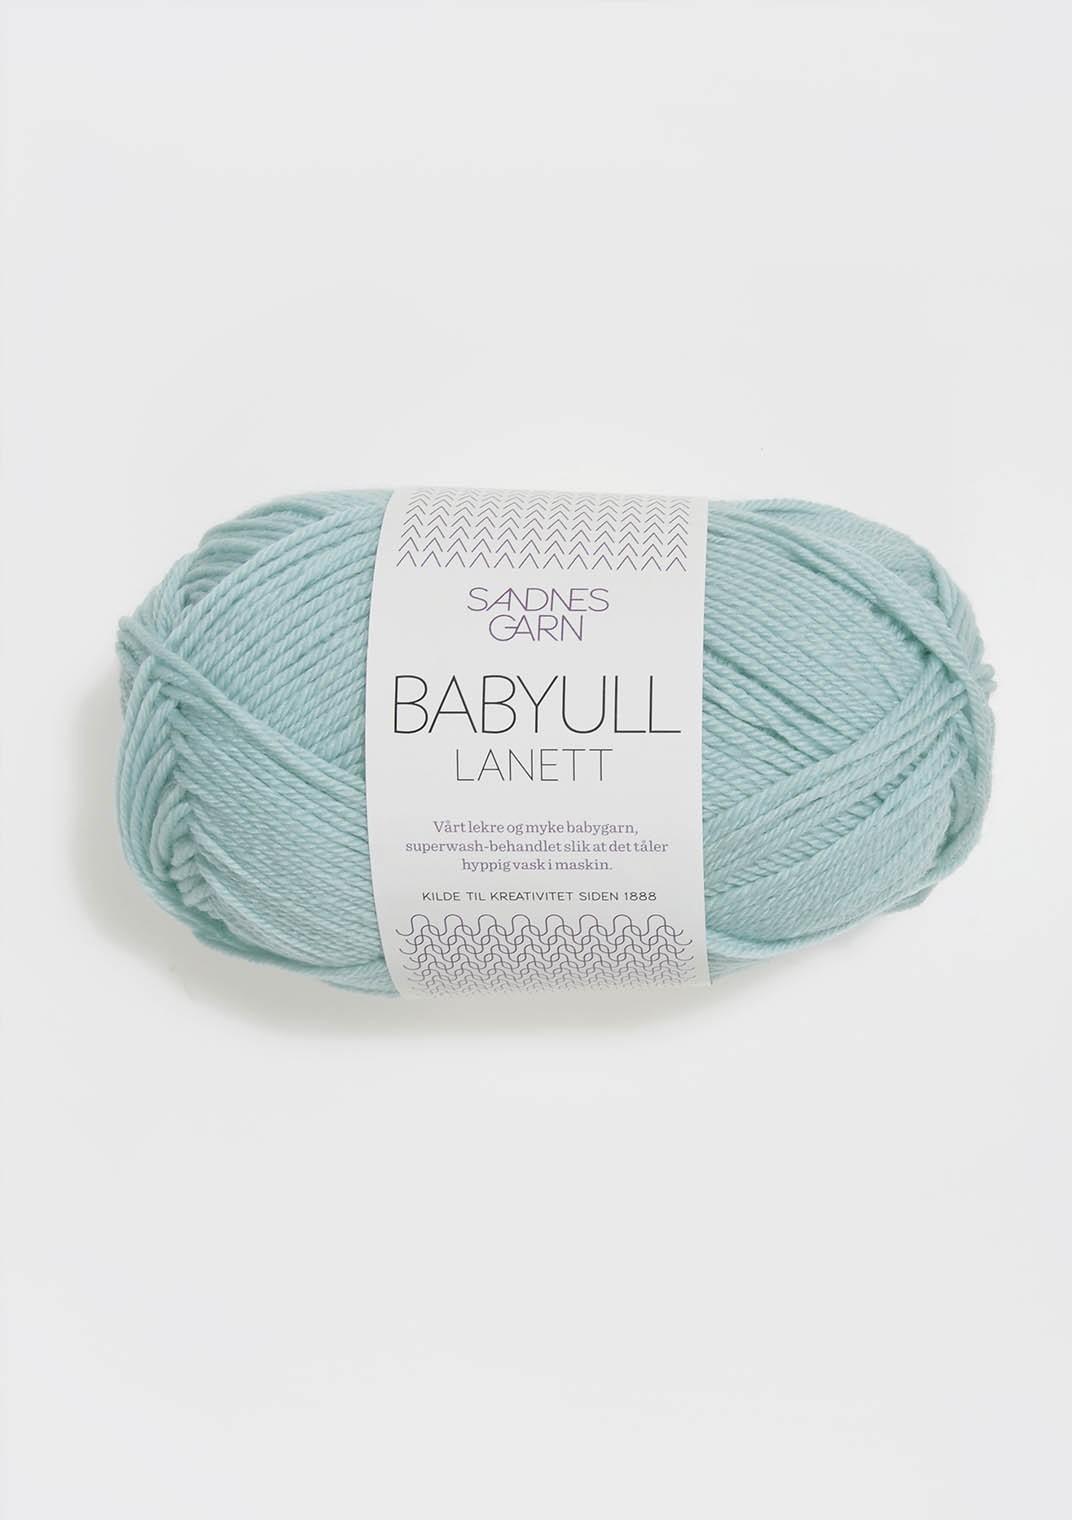 Babyull Lanett, Sandnes Garn